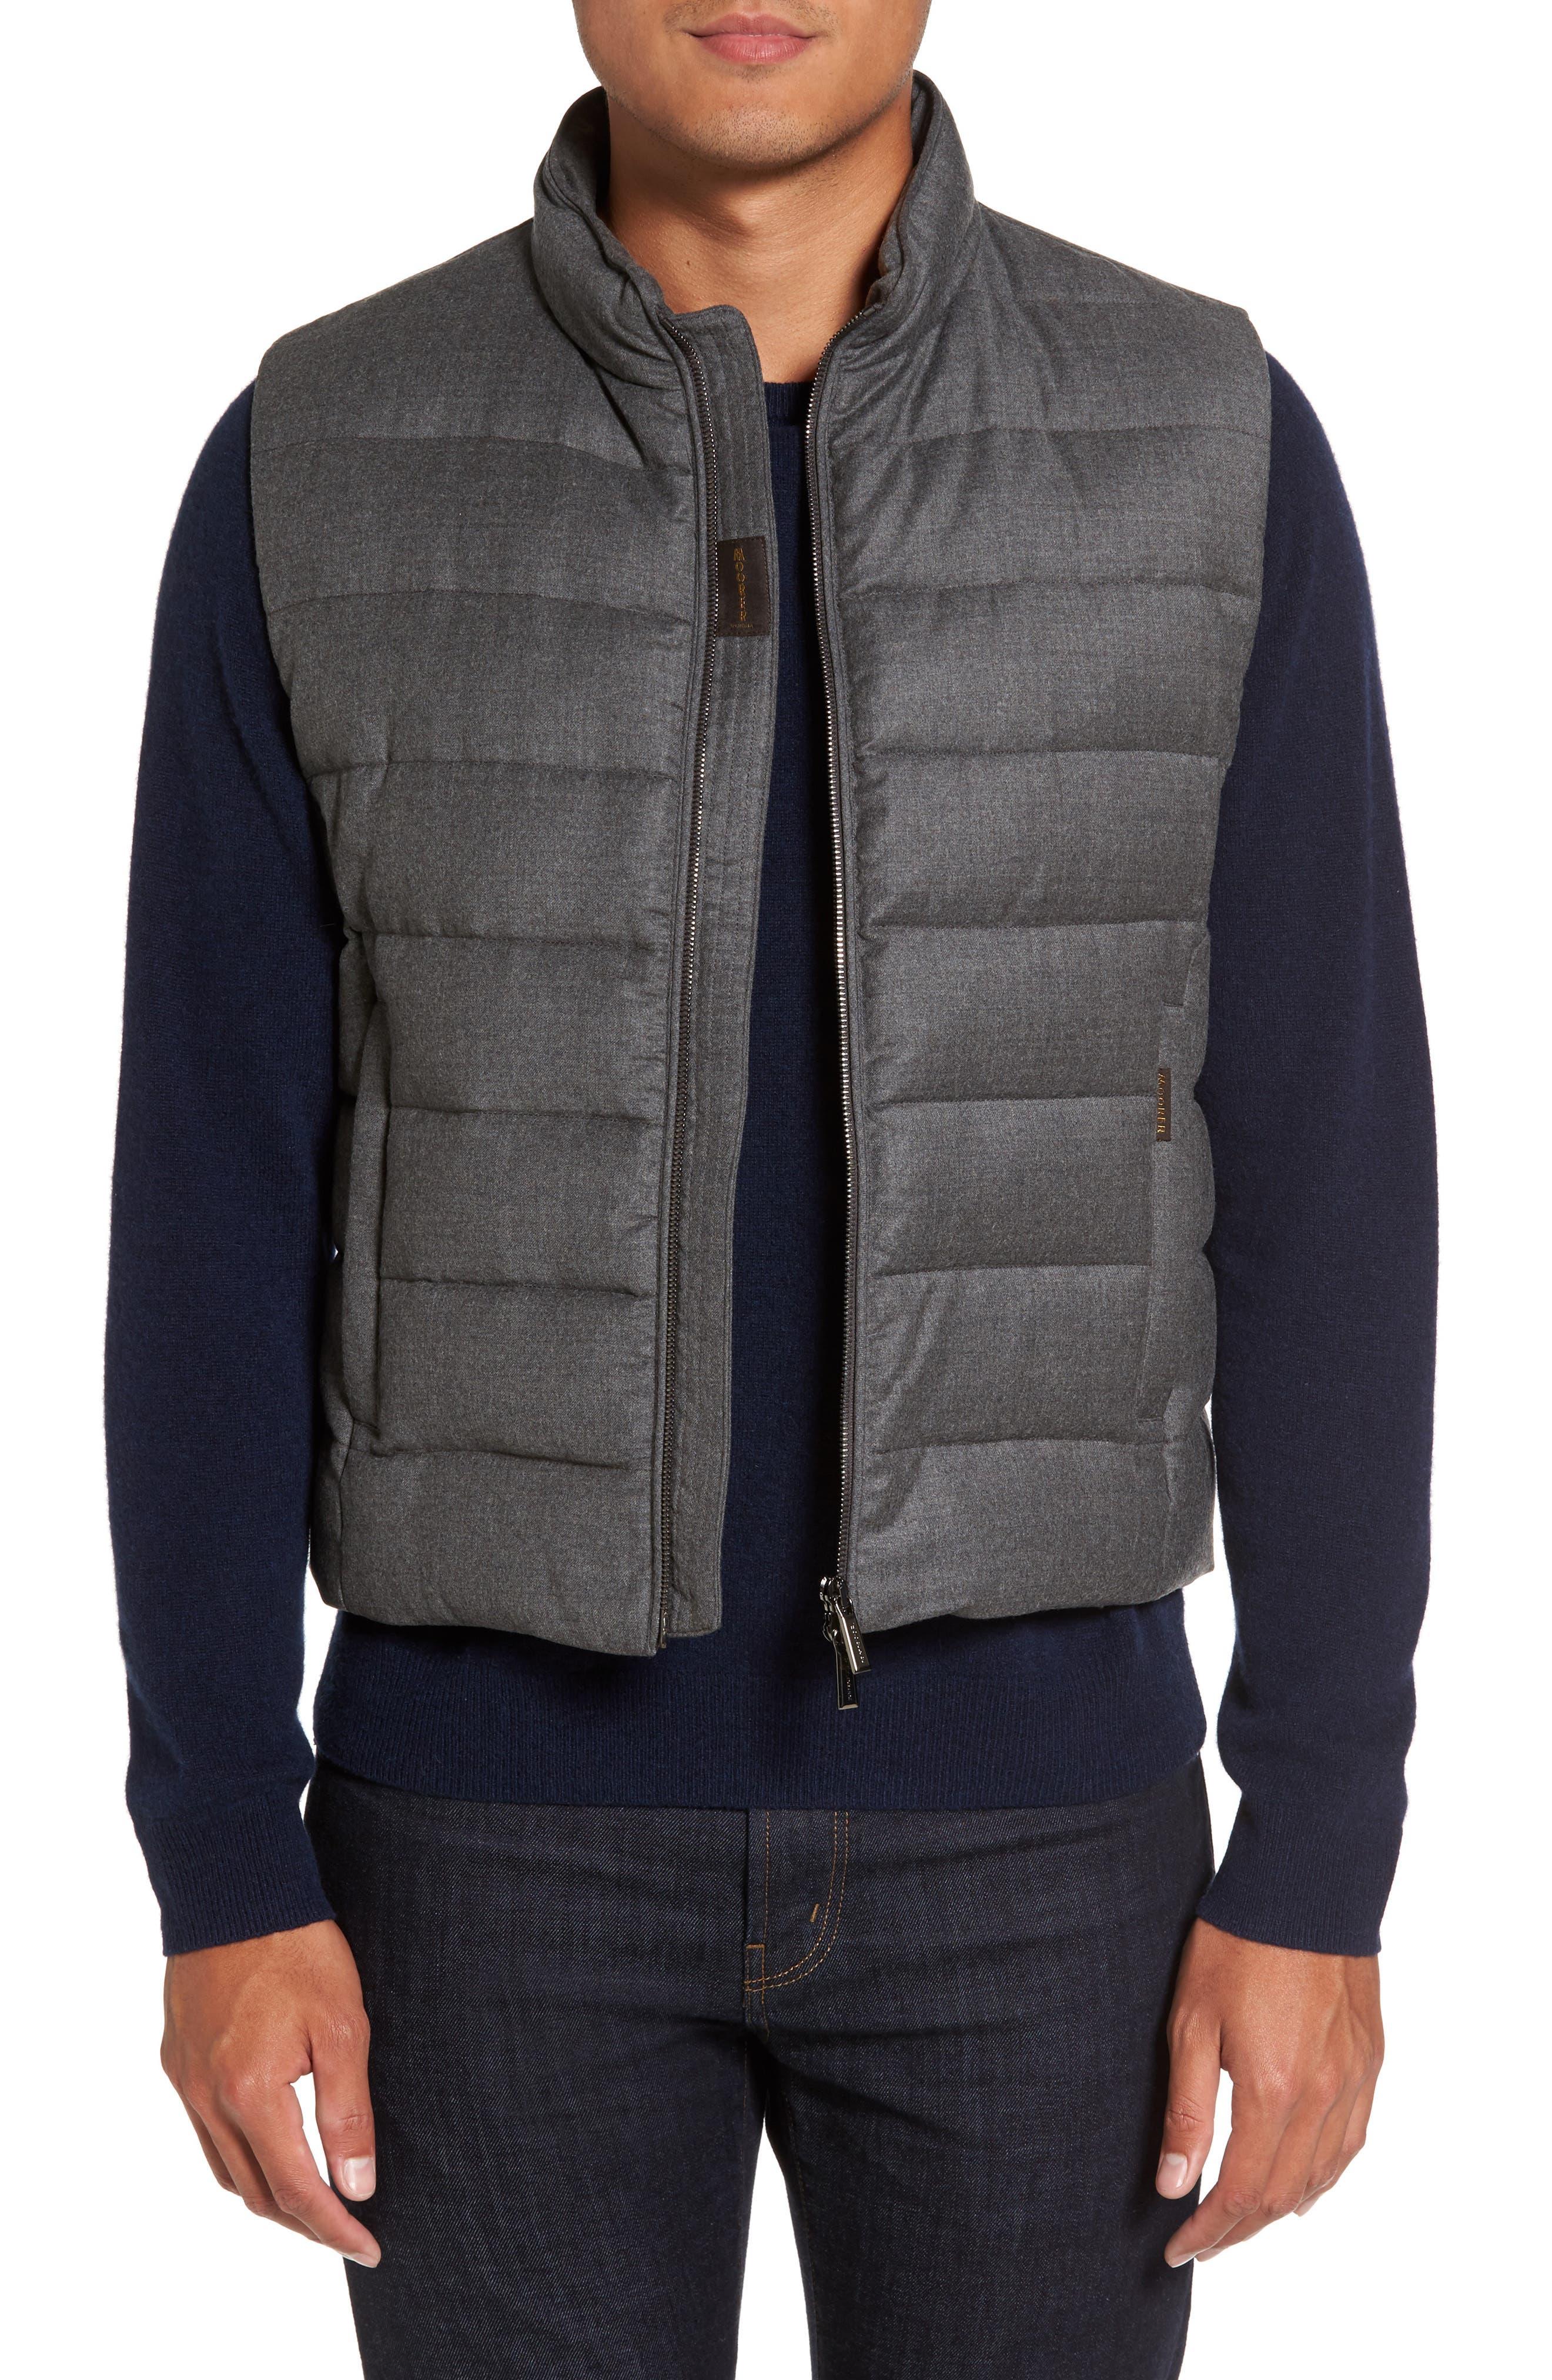 Oliver L Wool & Cashmere Flannel Waterproof Vest,                         Main,                         color, 030